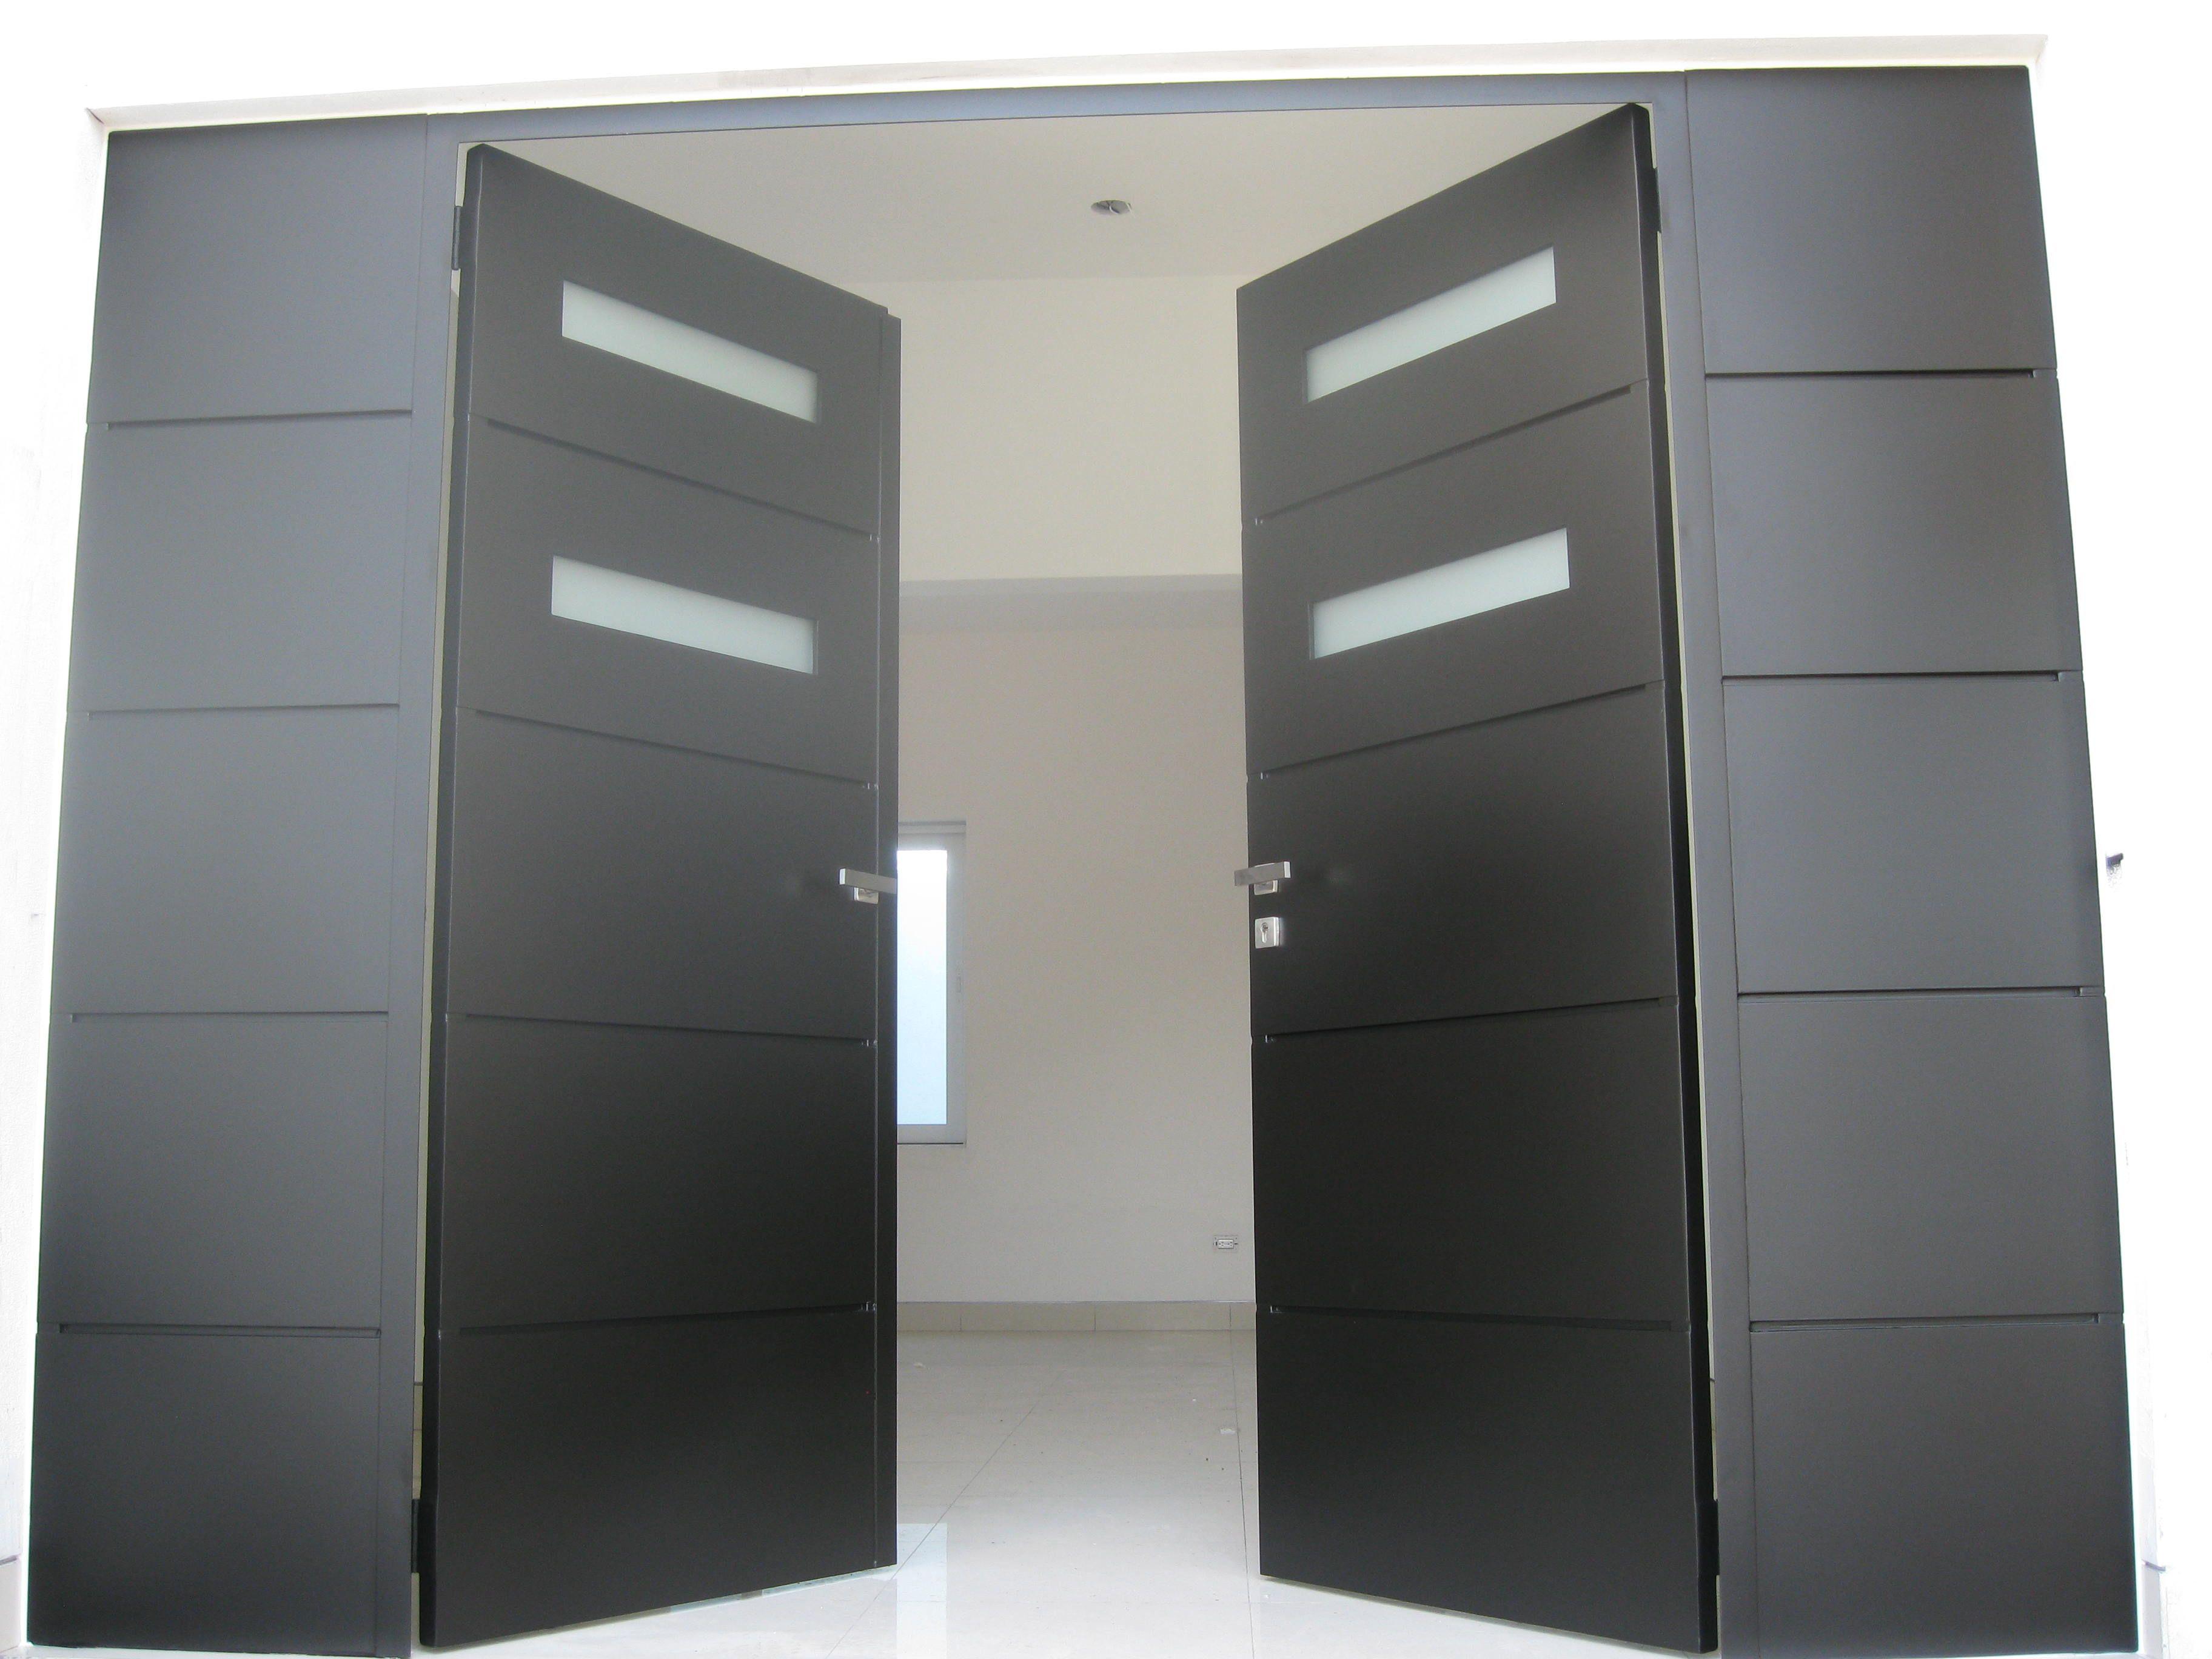 Porton pta herreria portones pinterest puertas for Diseno puerta principal